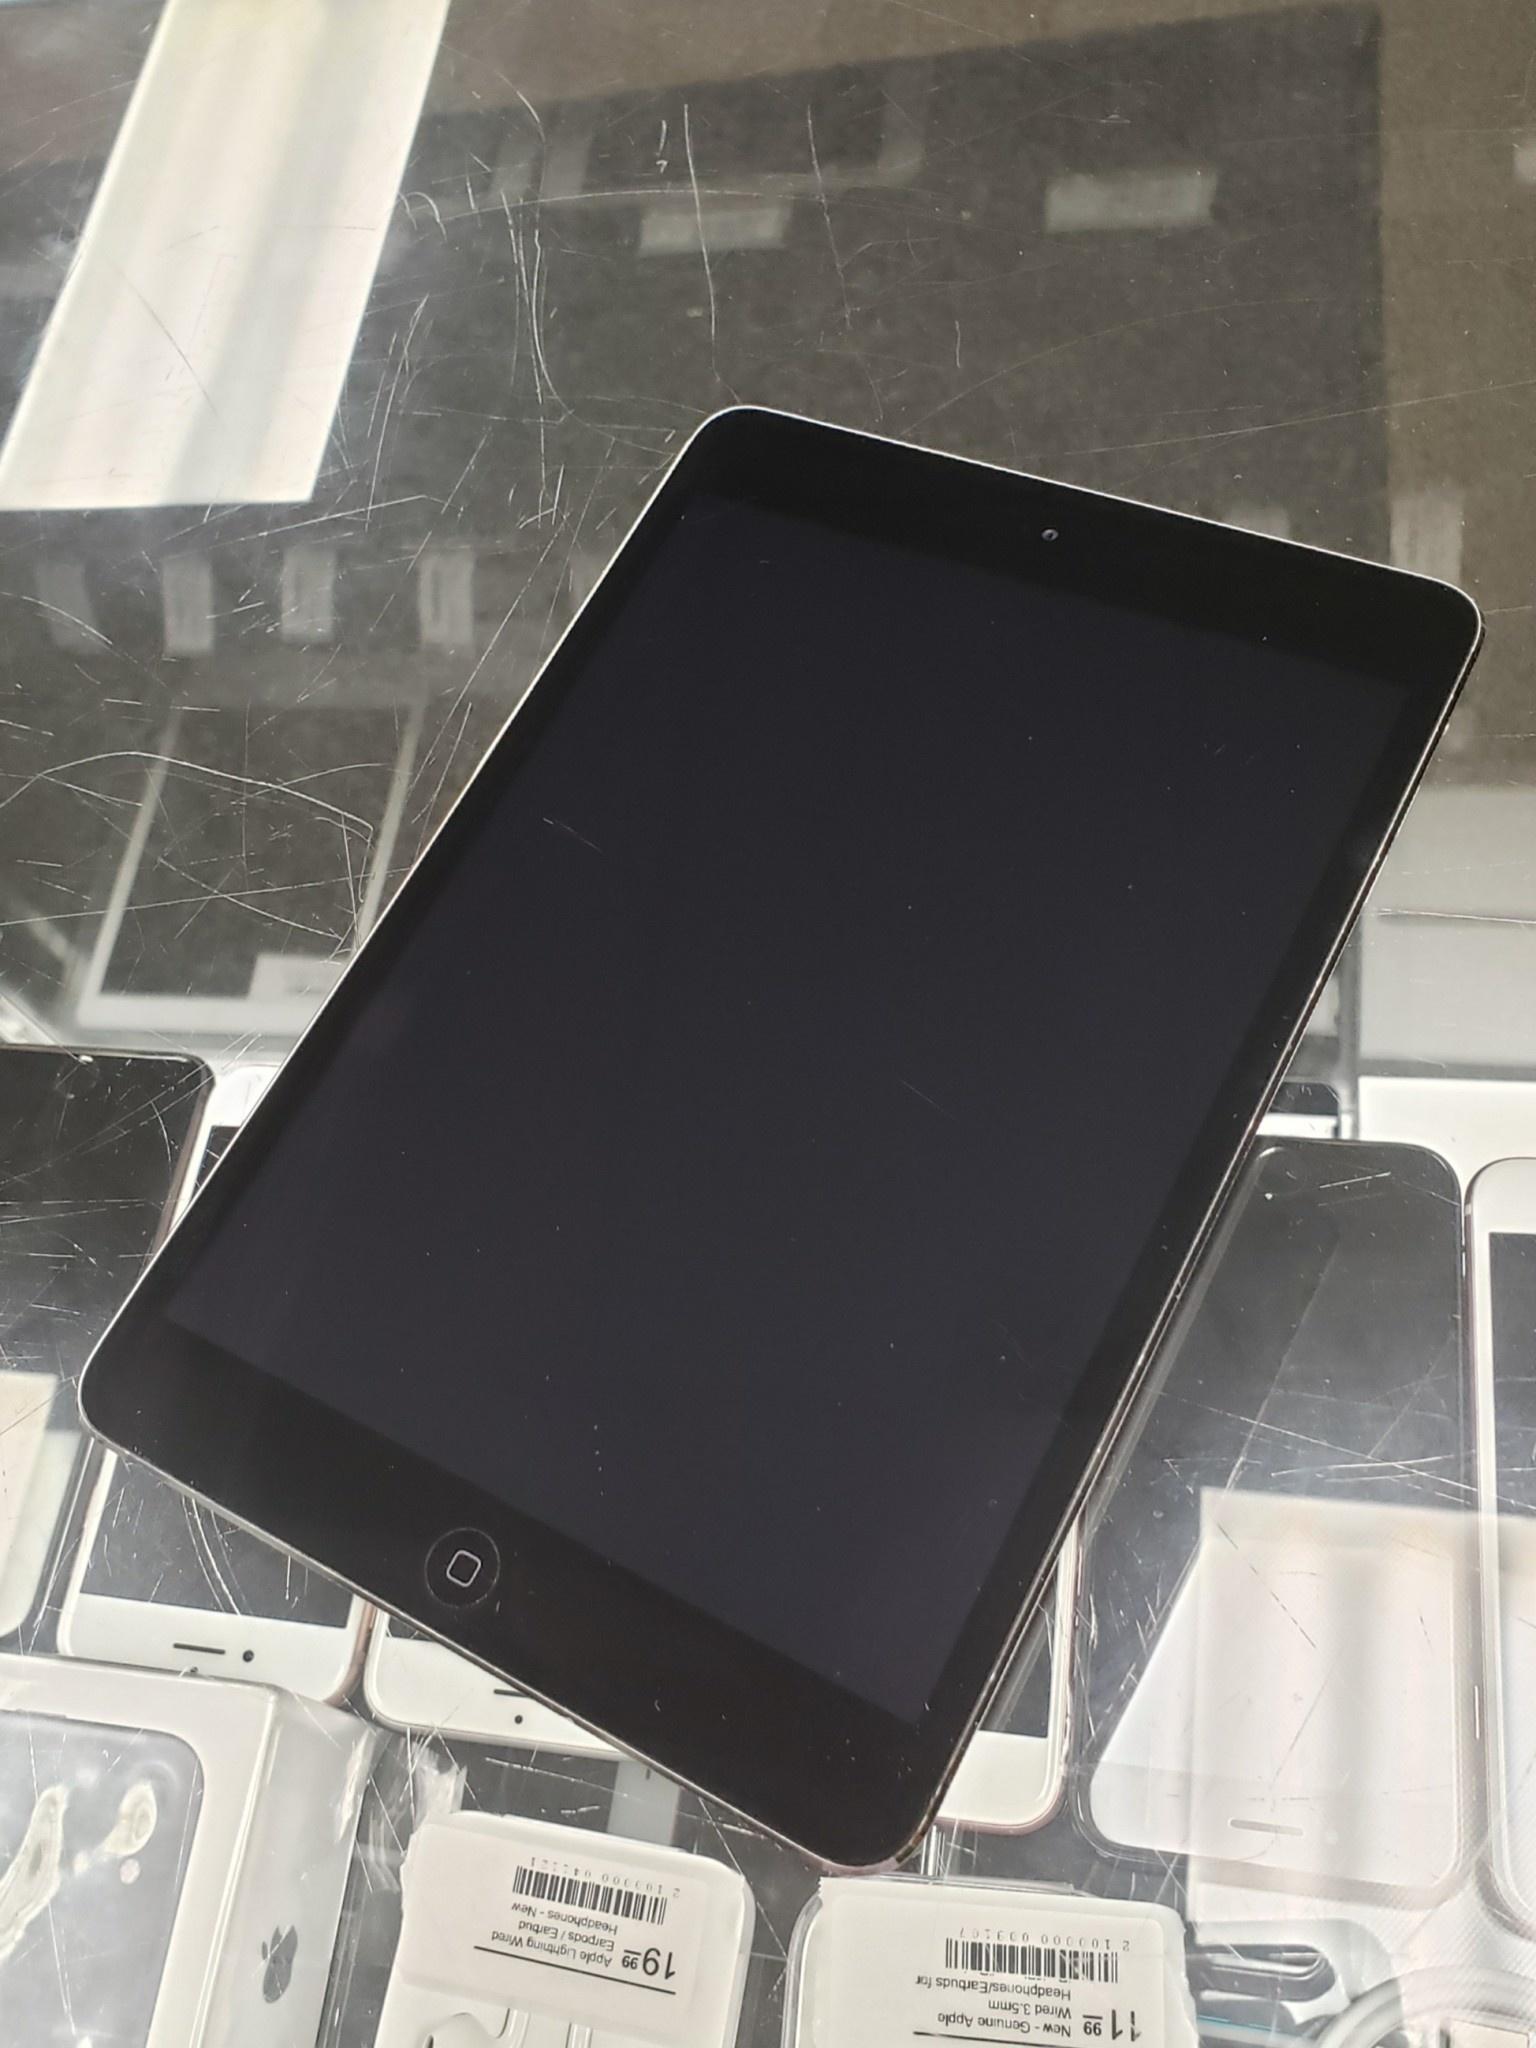 iPad Mini 2nd Gen. - 16GB - Space Grey / Black - Fair Condition